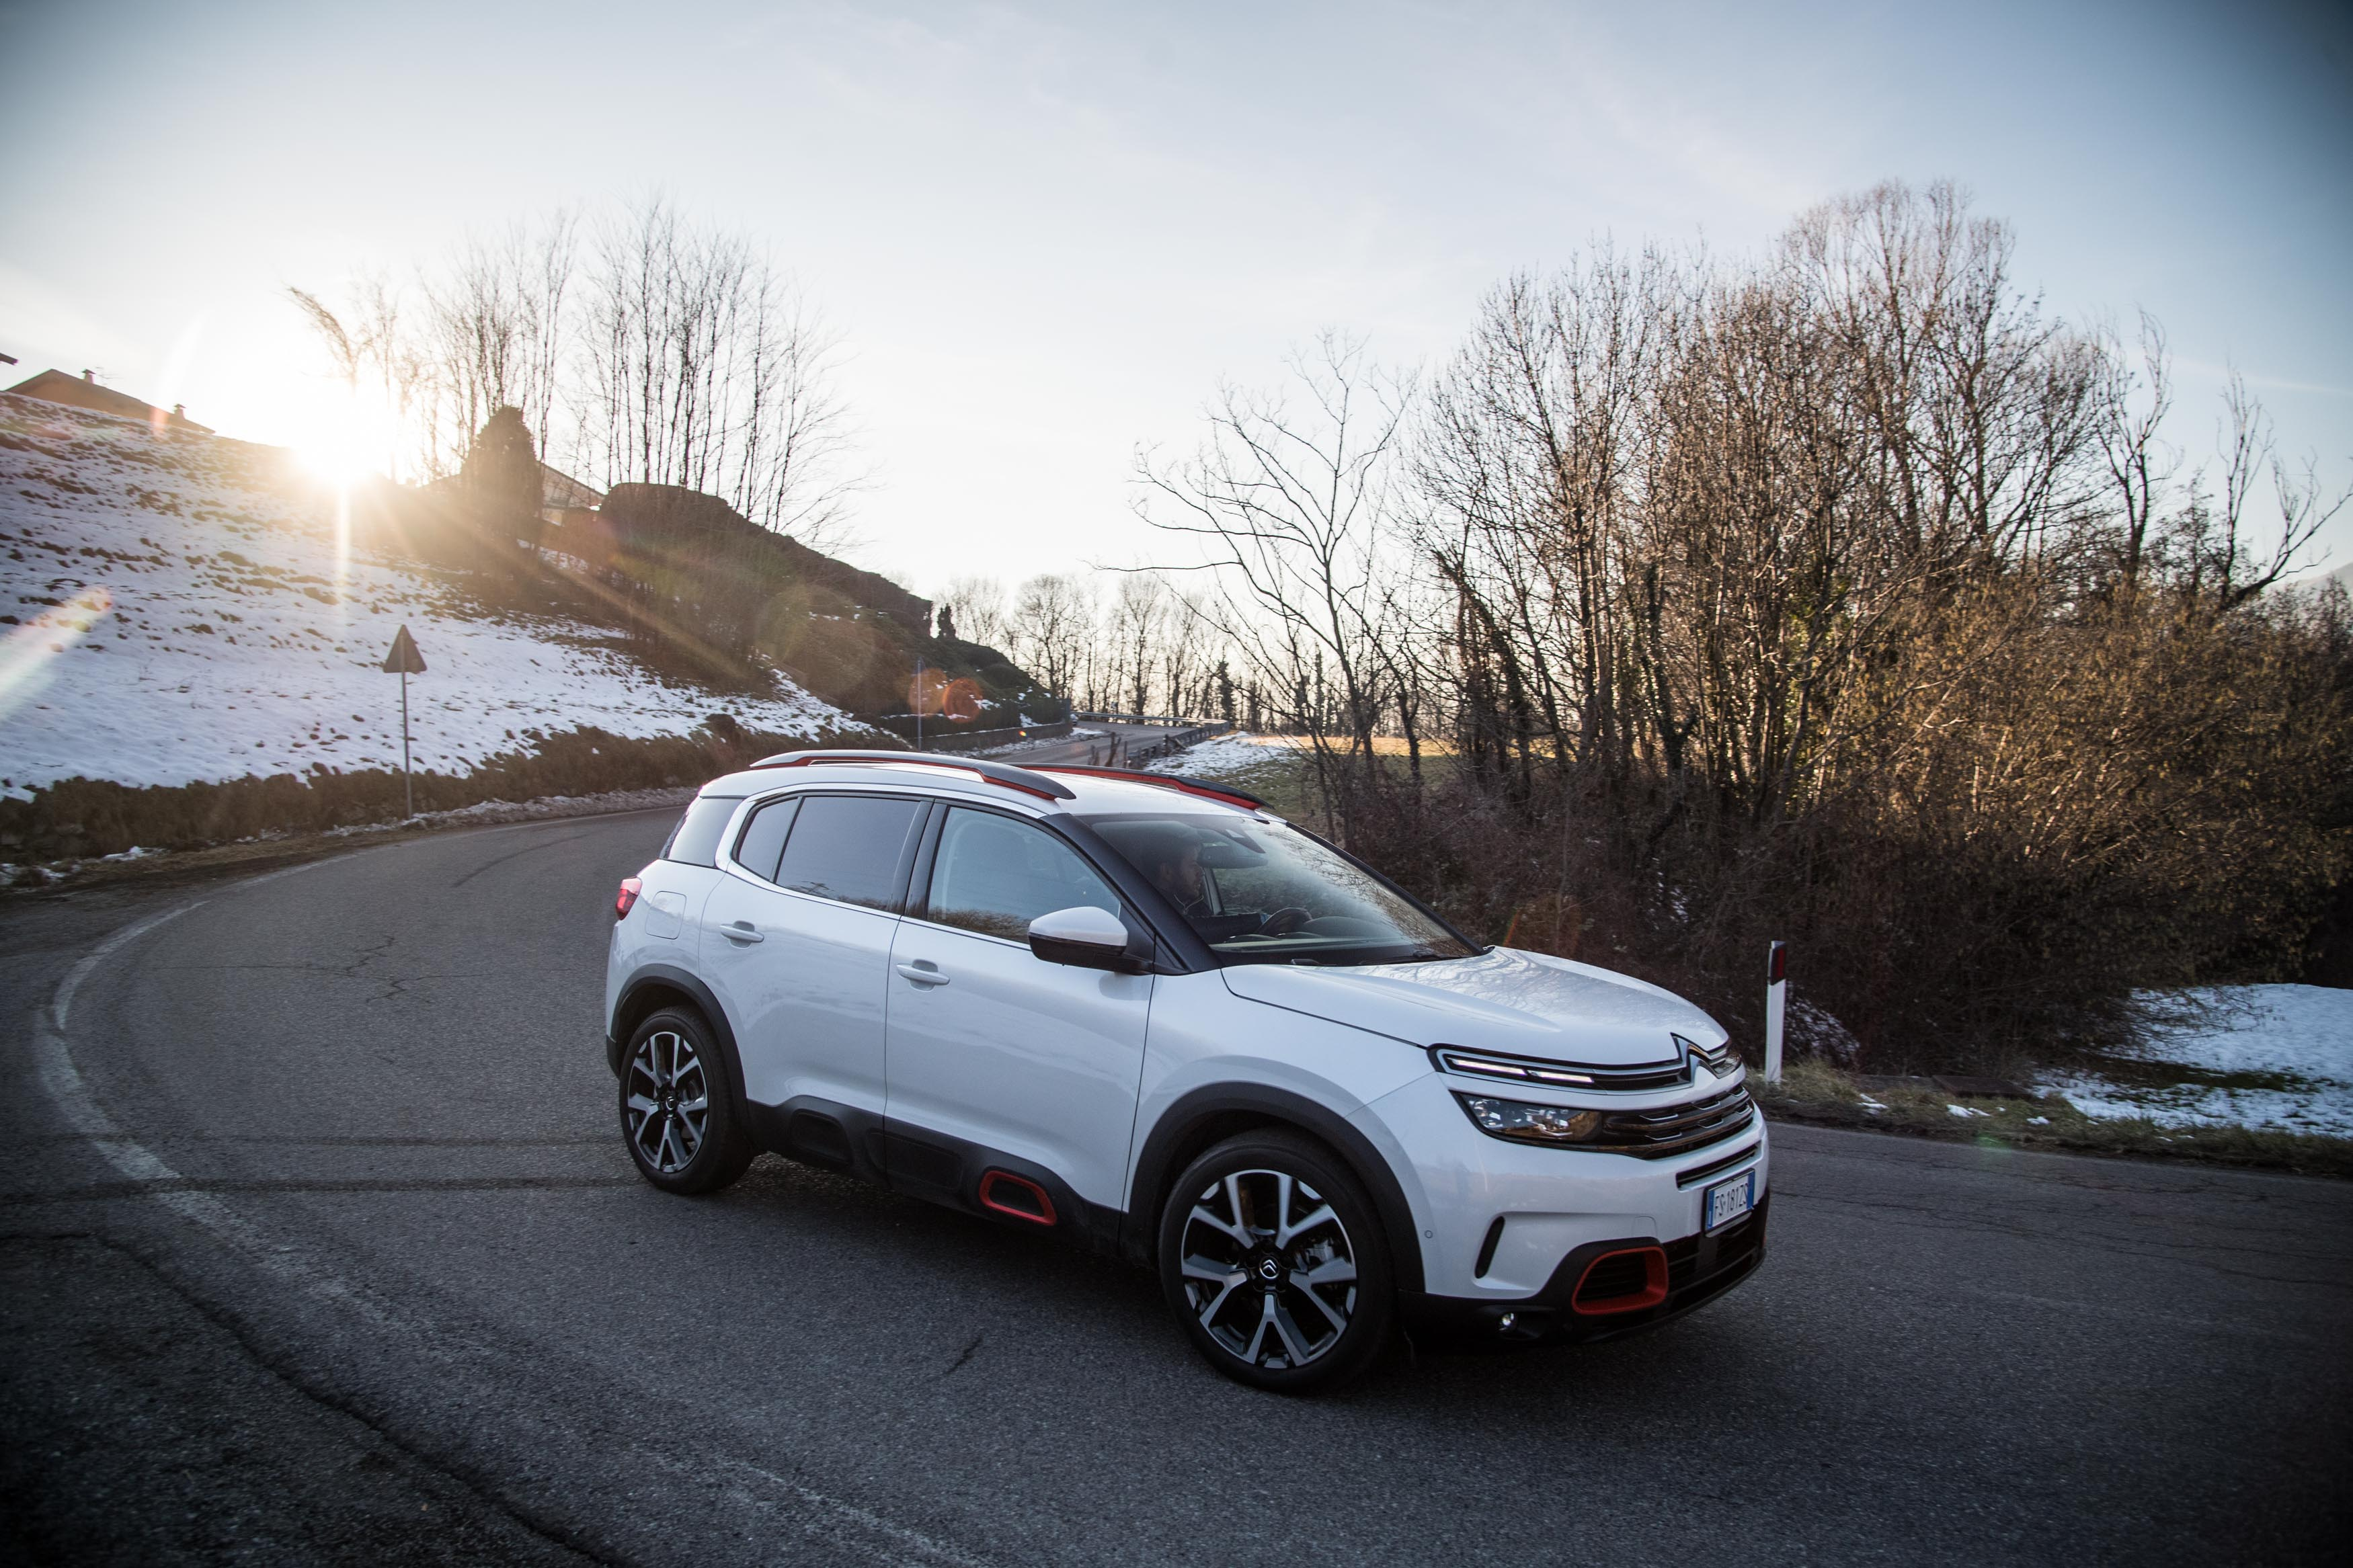 prova-nuova-citroen-c5-aircross-2019